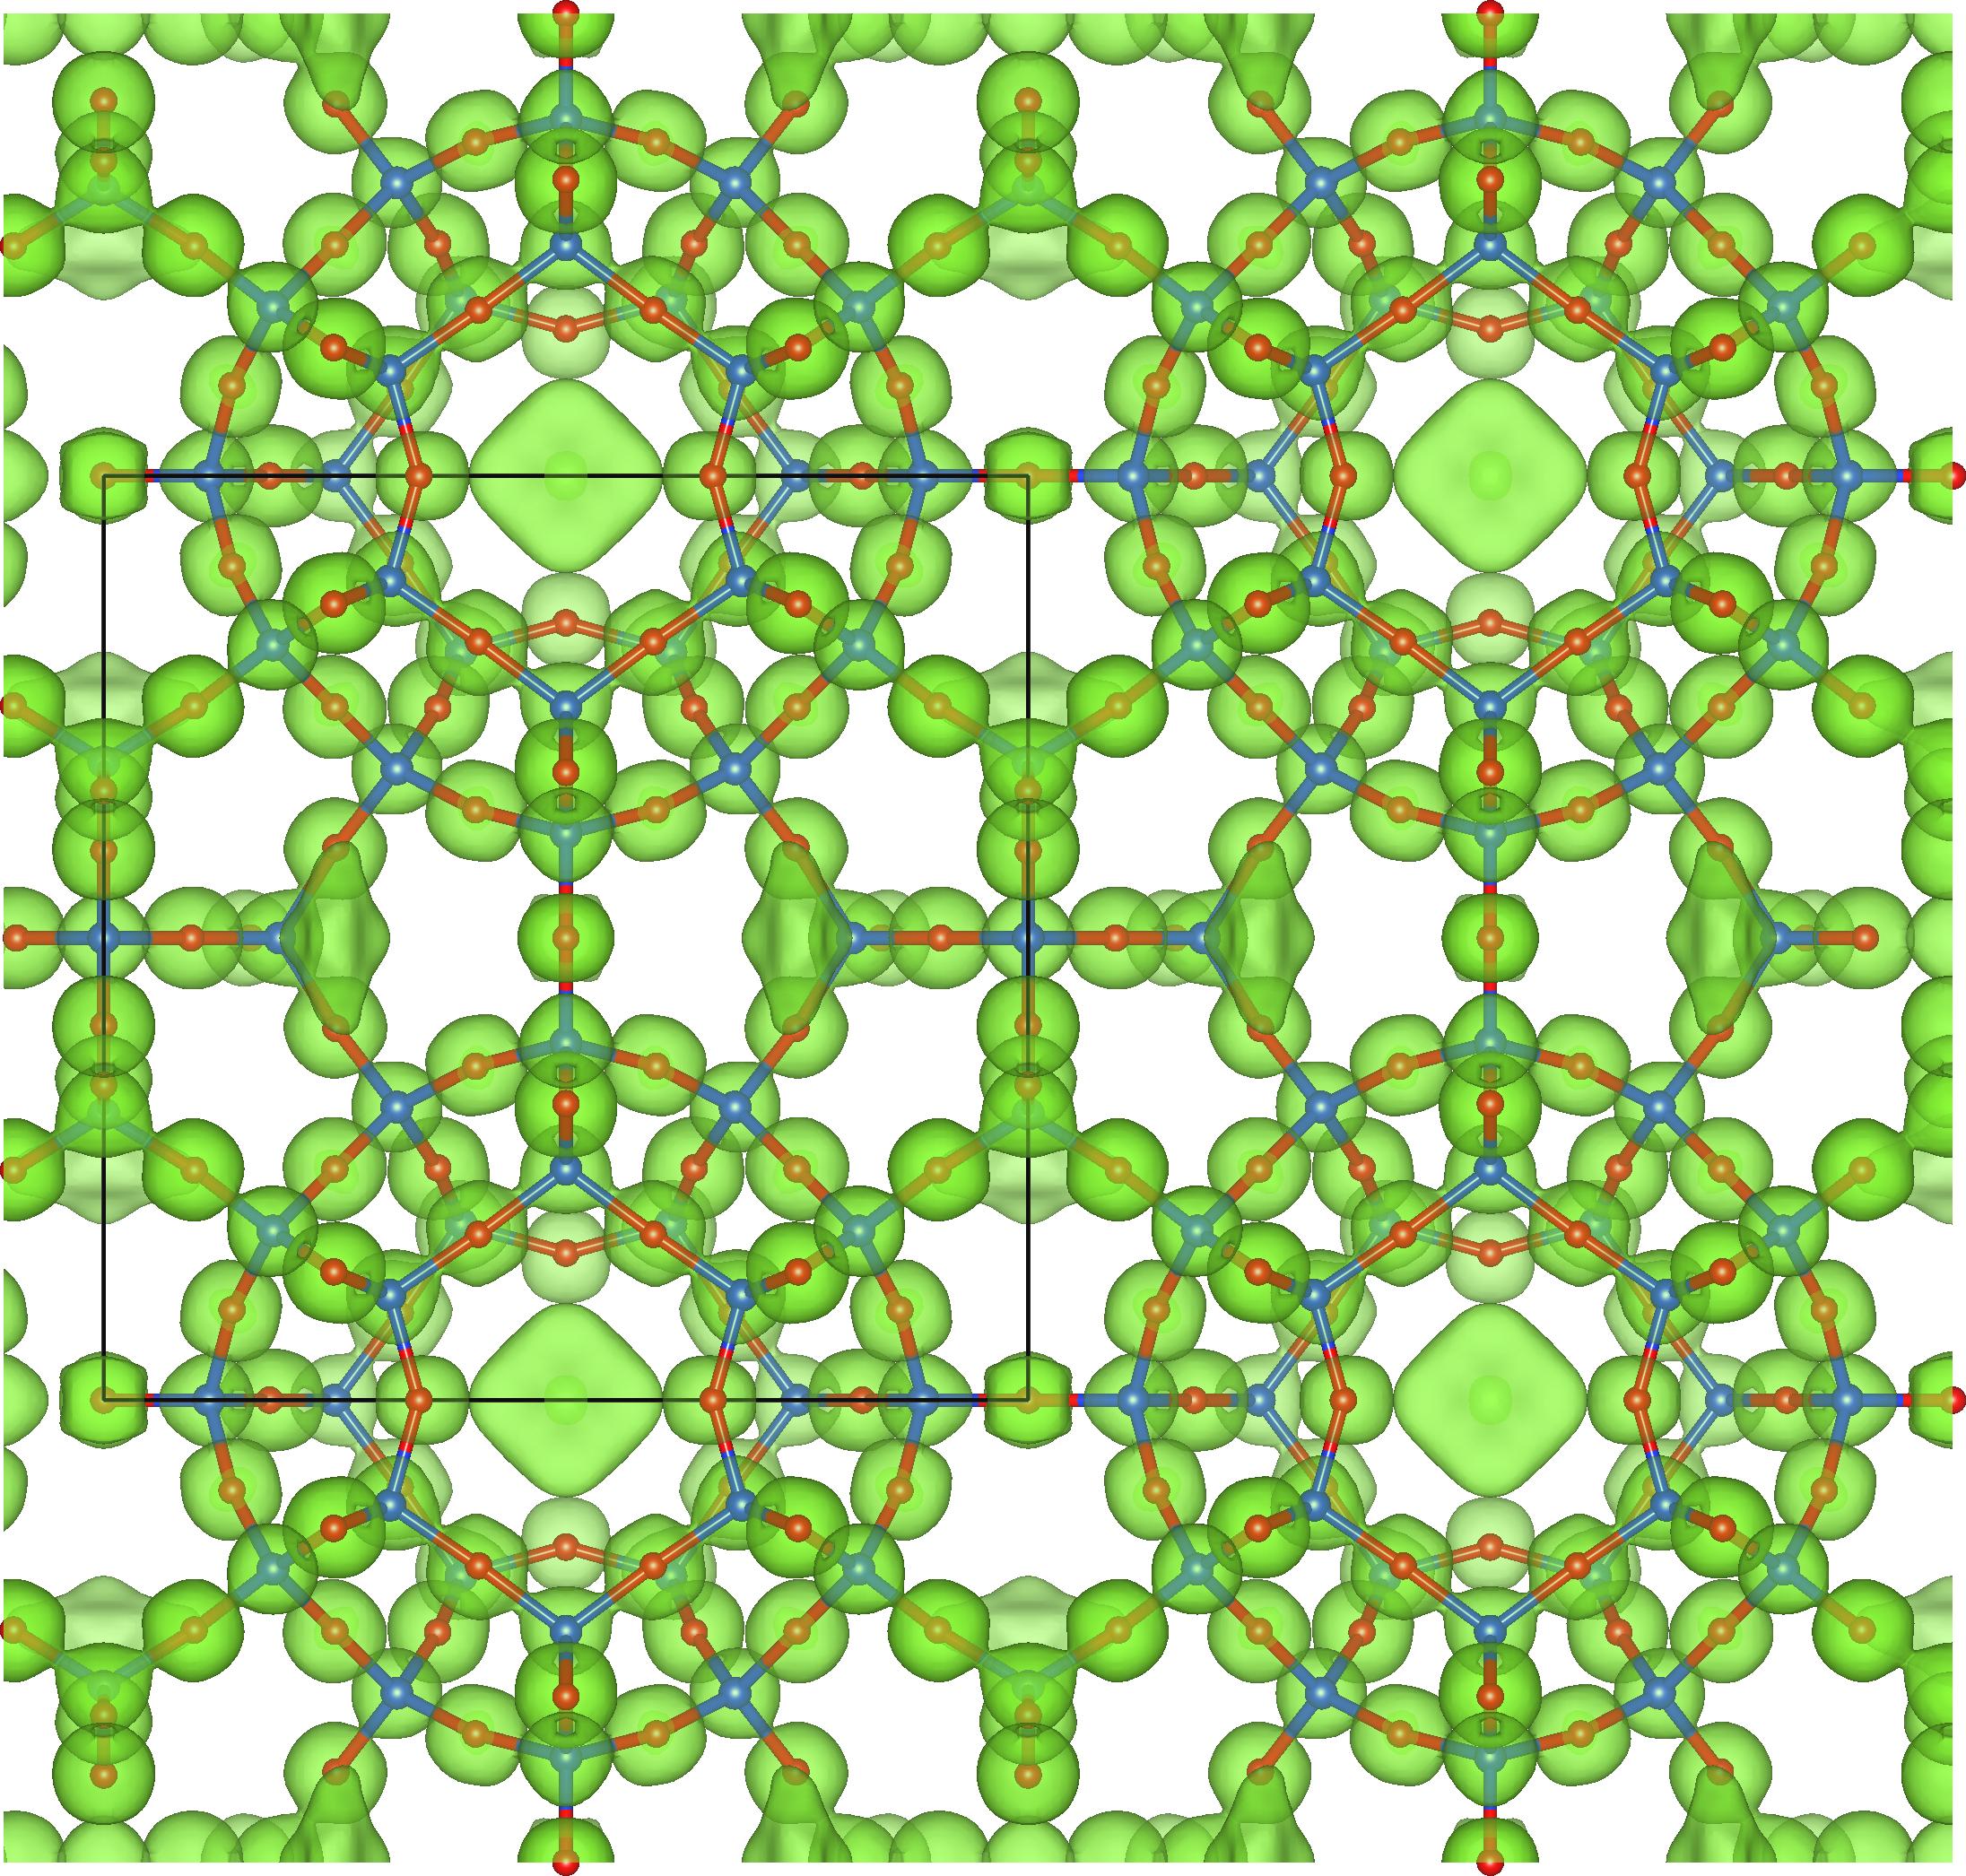 melano-structure-density.png